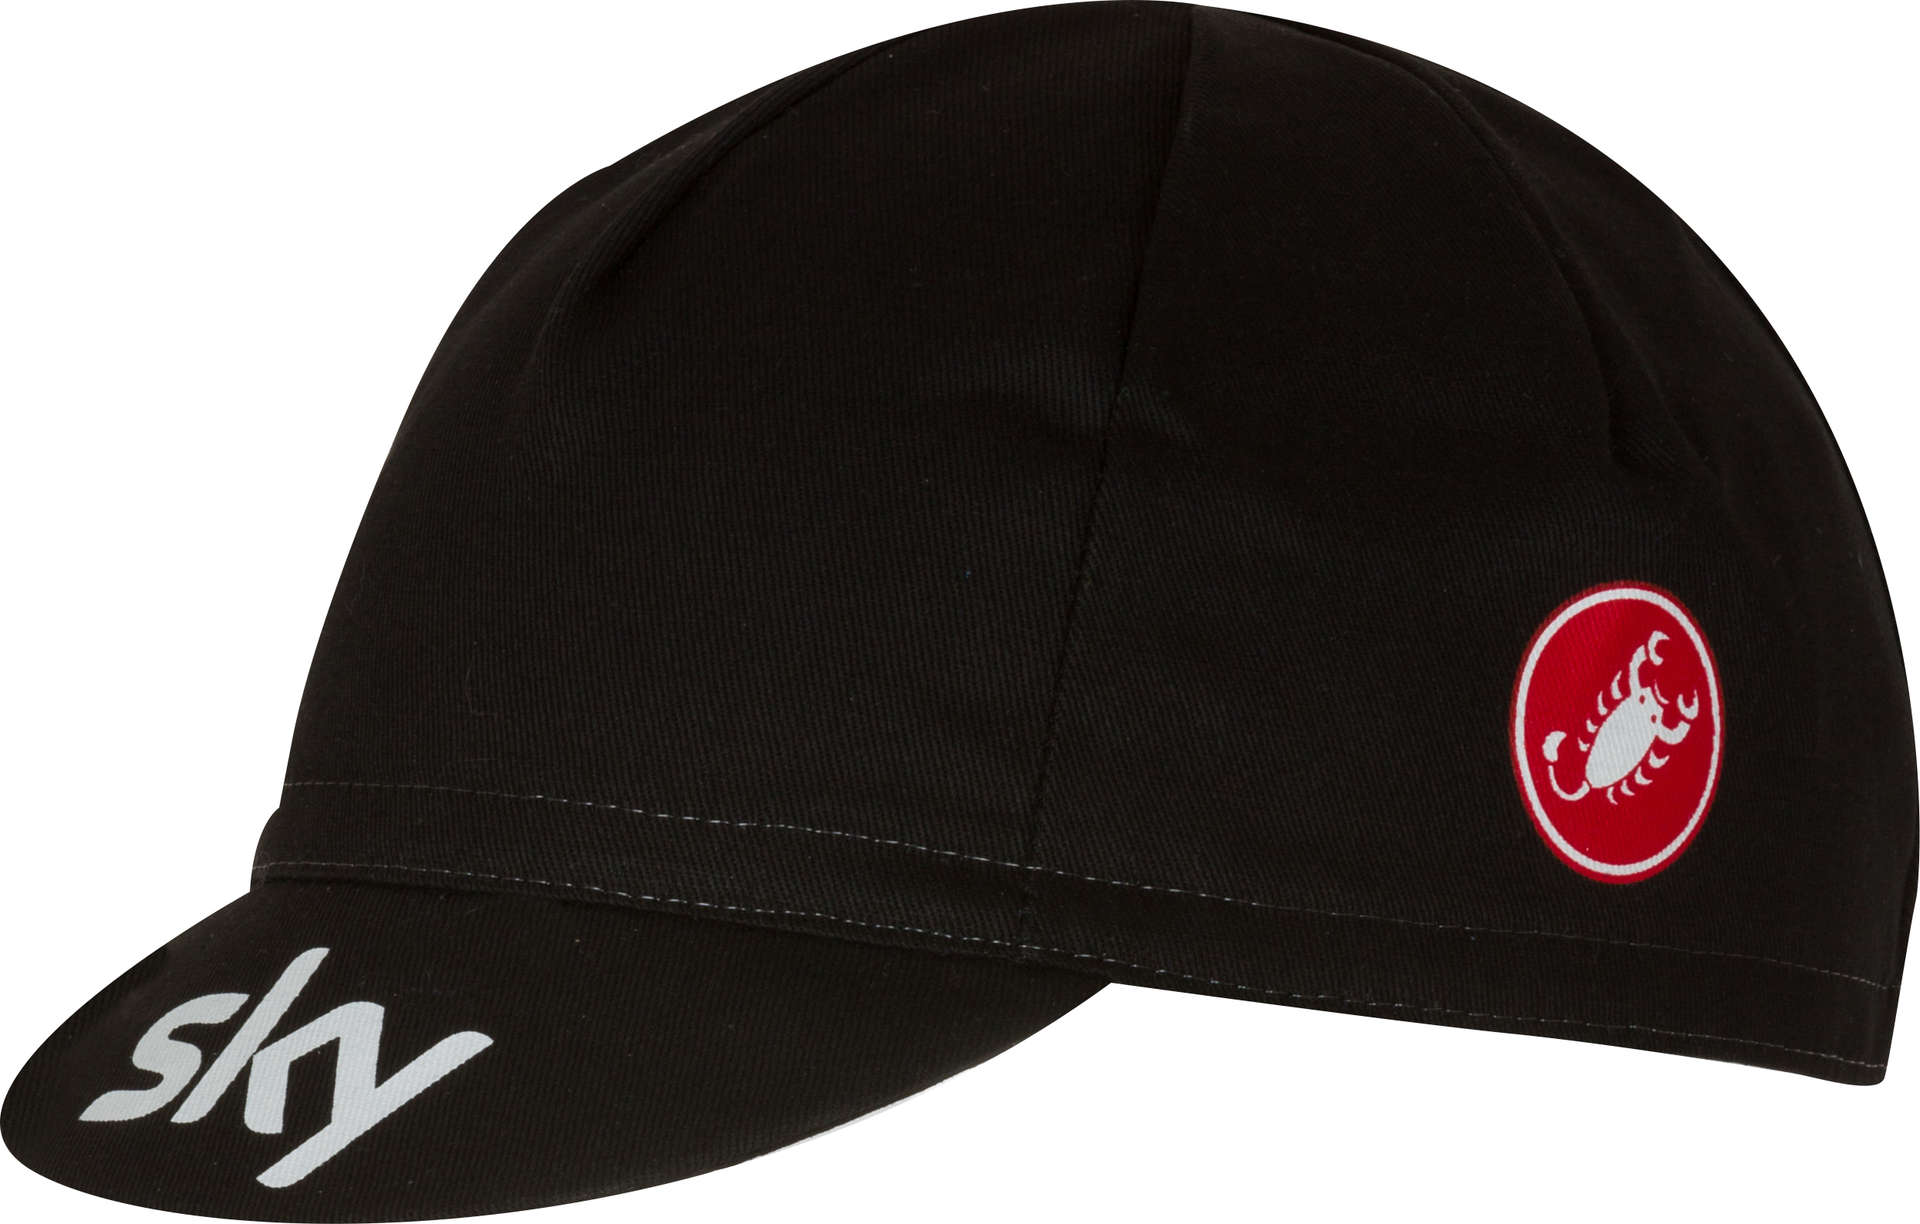 Castelli team cycling cap zwart koop je bij jpg 1920x1224 Team sky cycling  logo 58f4d4f30